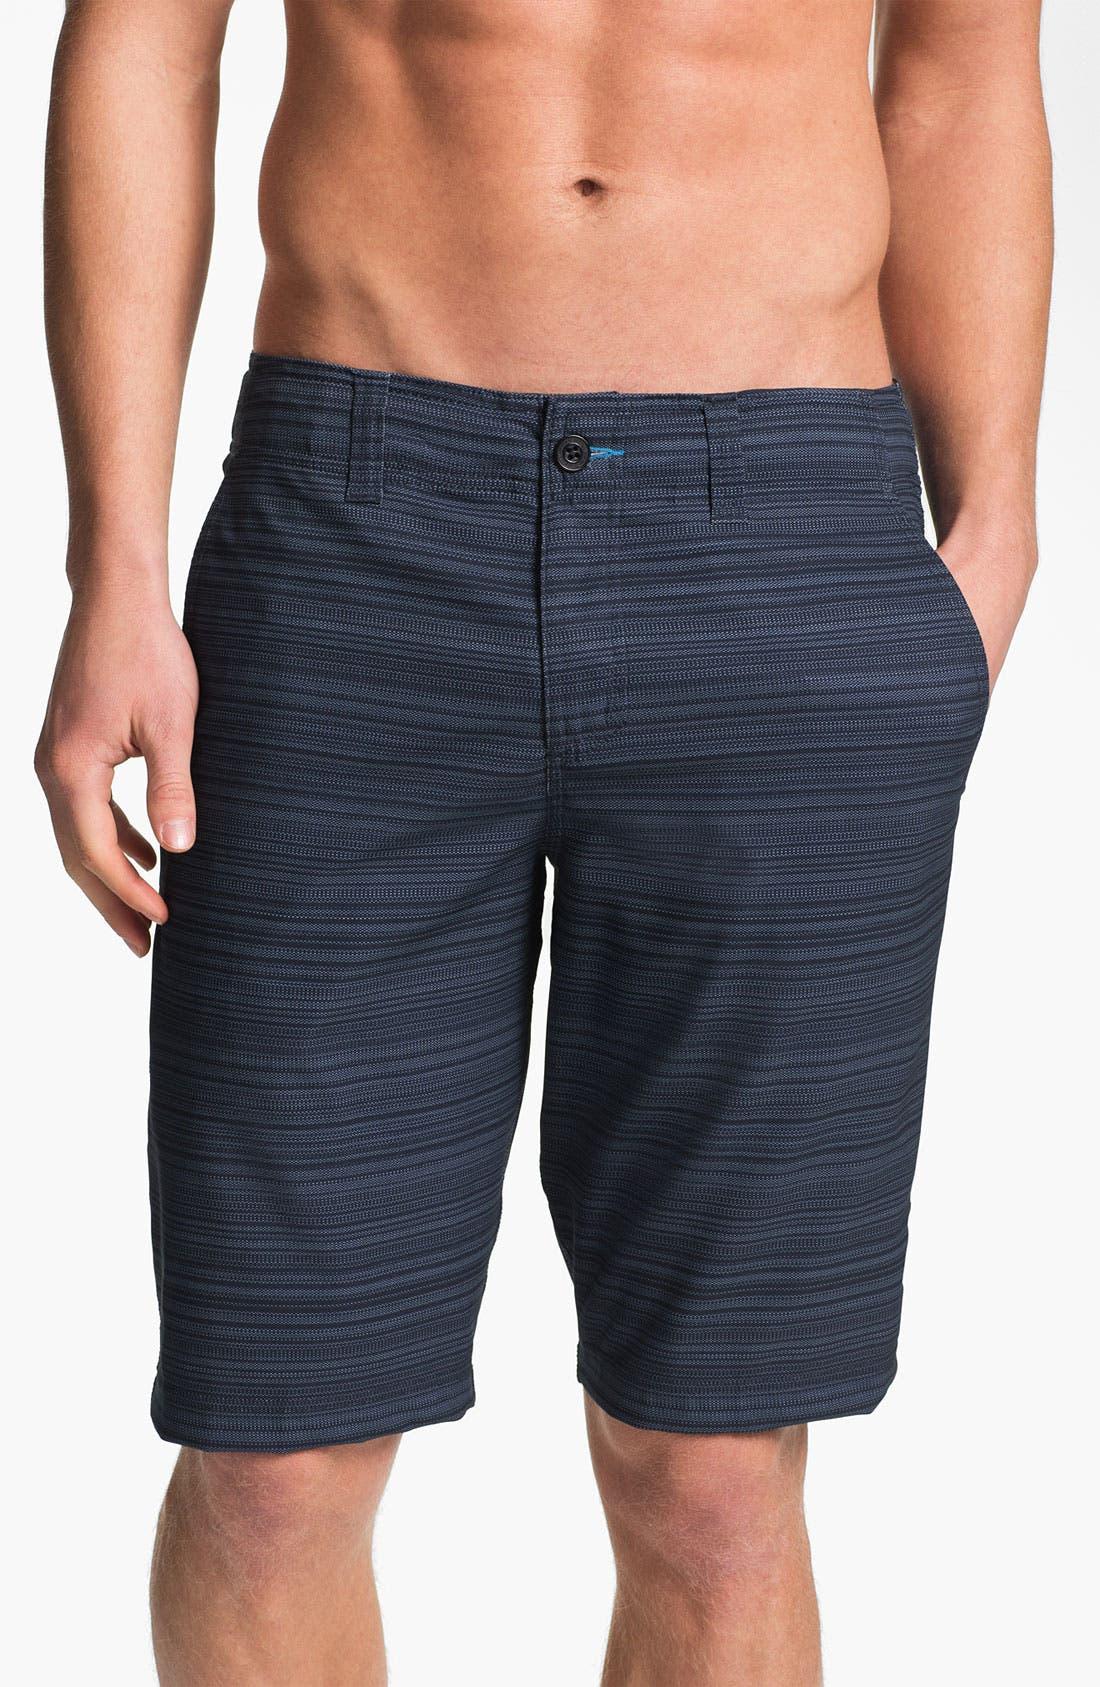 Alternate Image 1 Selected - O'Neill 'Wall Street' Hybrid Shorts